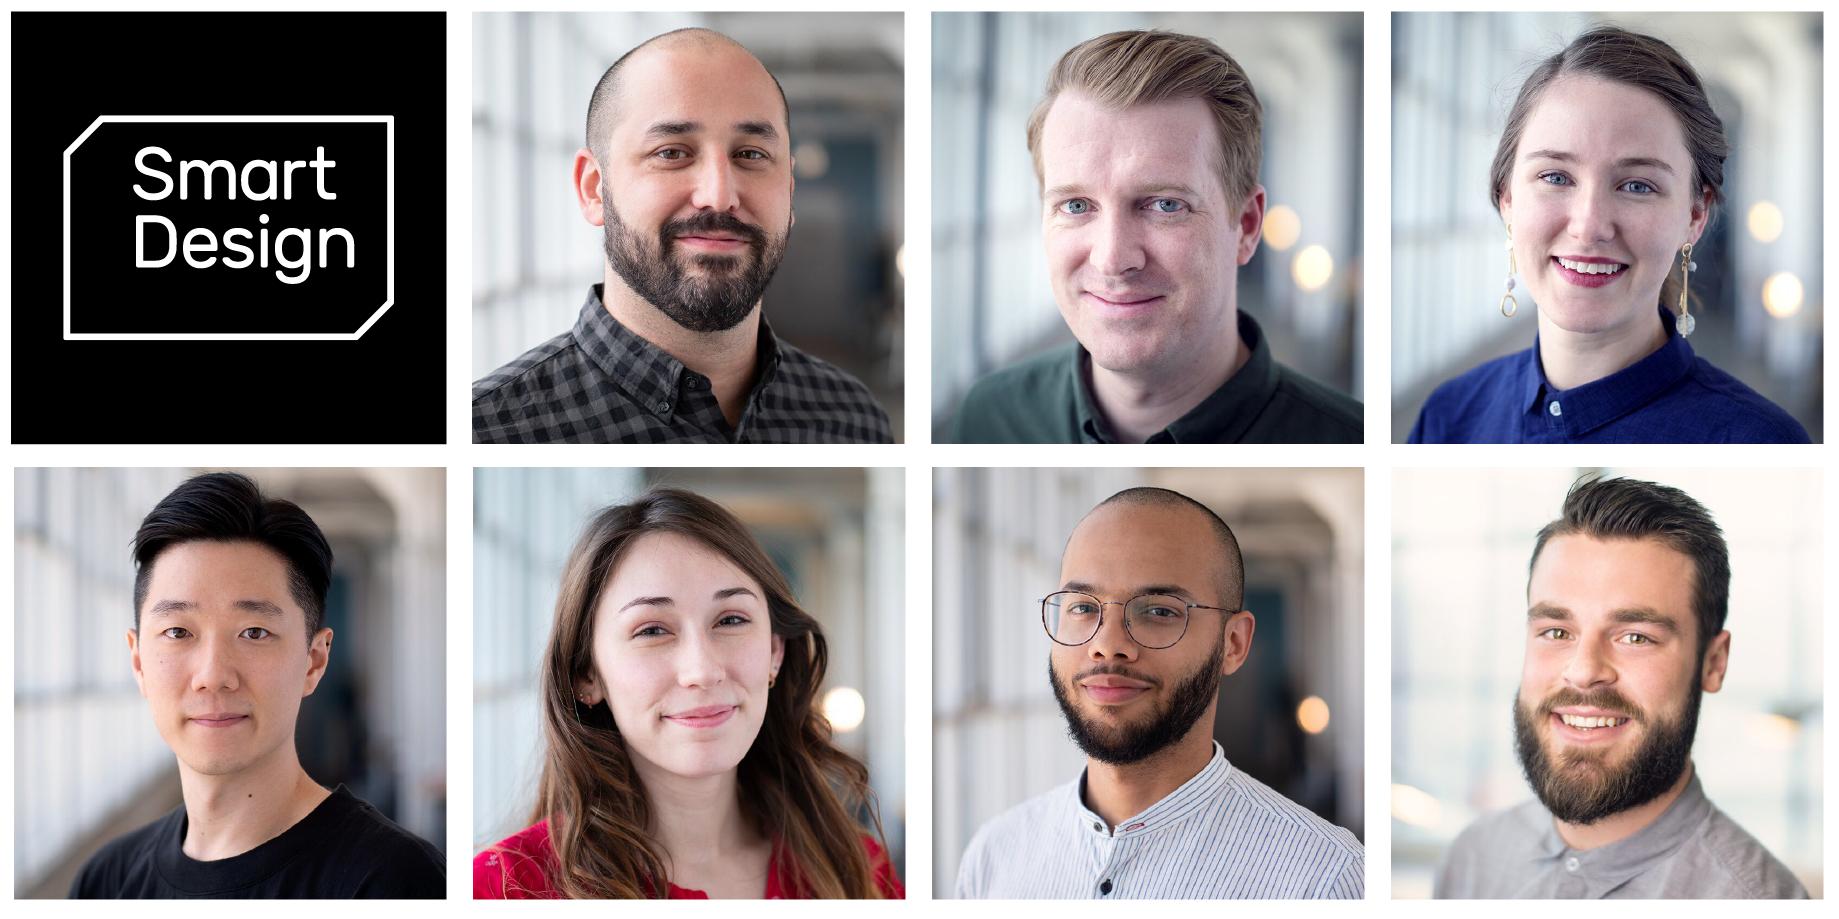 Smarties: Dan Grossman, James Krause, Alaina Applebaum, Albert Kwak, Anna Miller, Brandon Rodriguez, Neil Kwiatkoski